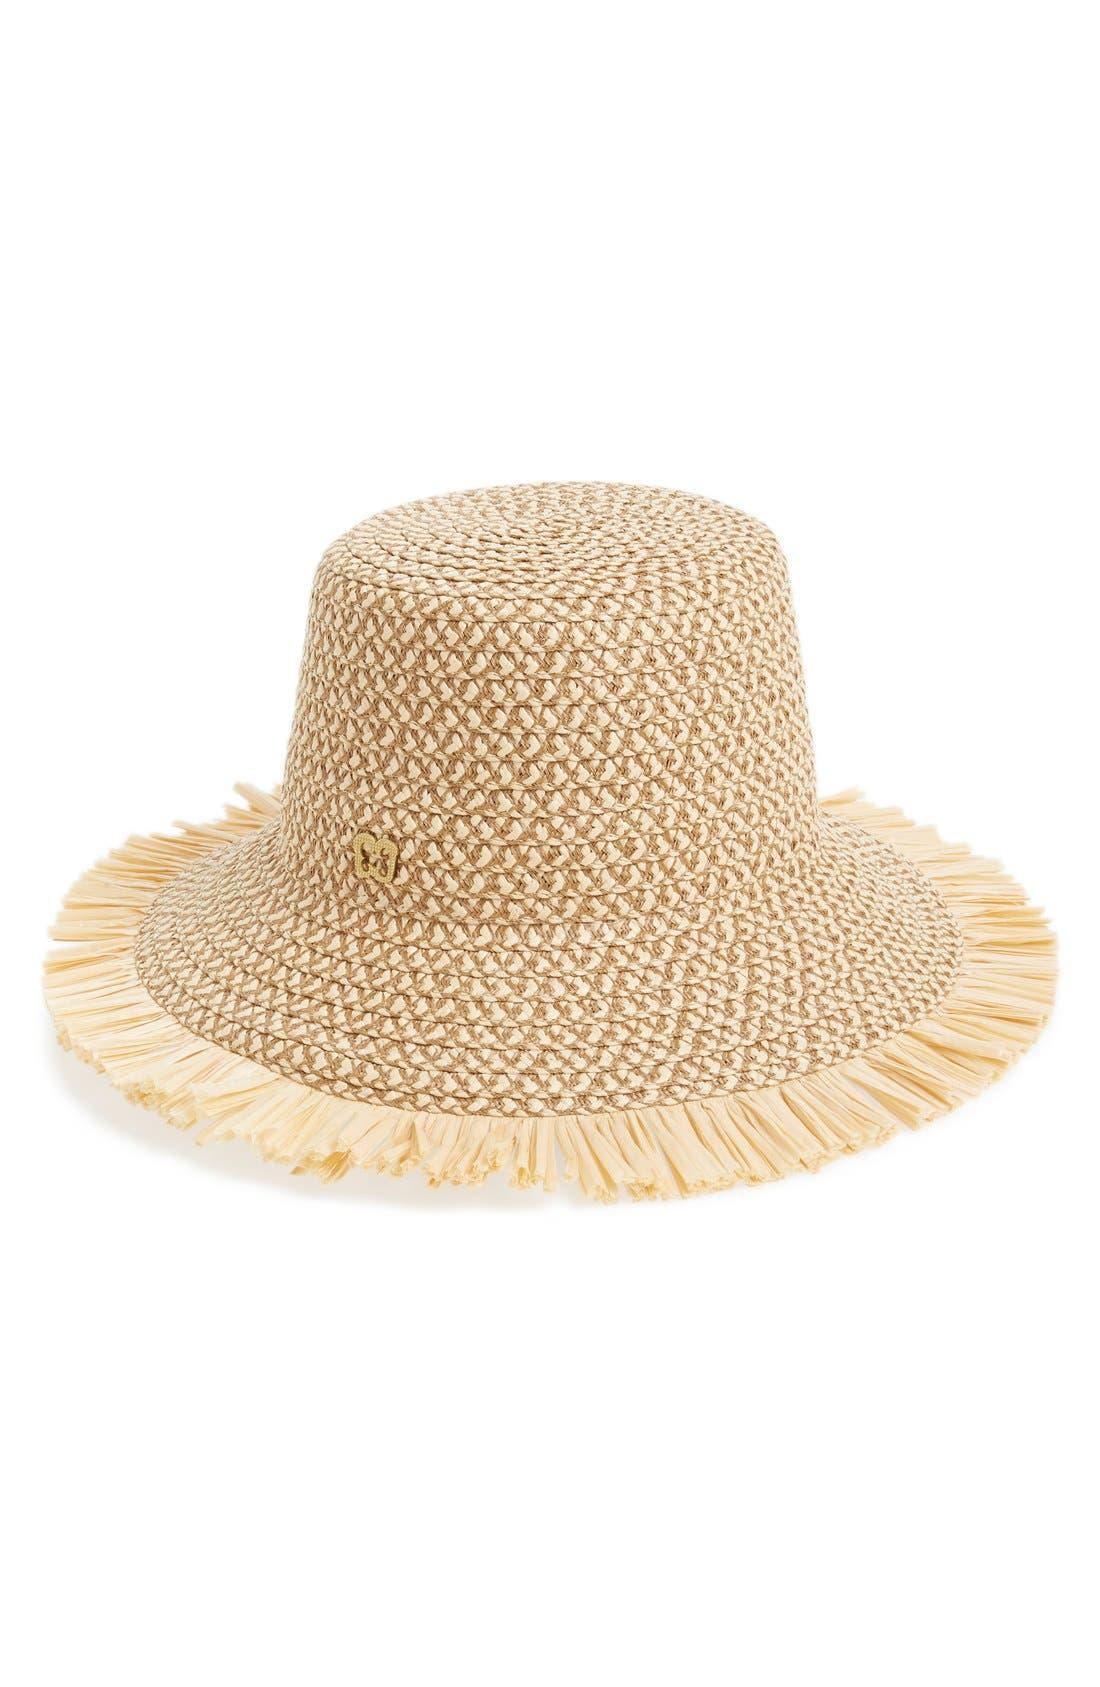 ERIC JAVITS 'Tiki' Bucket Hat